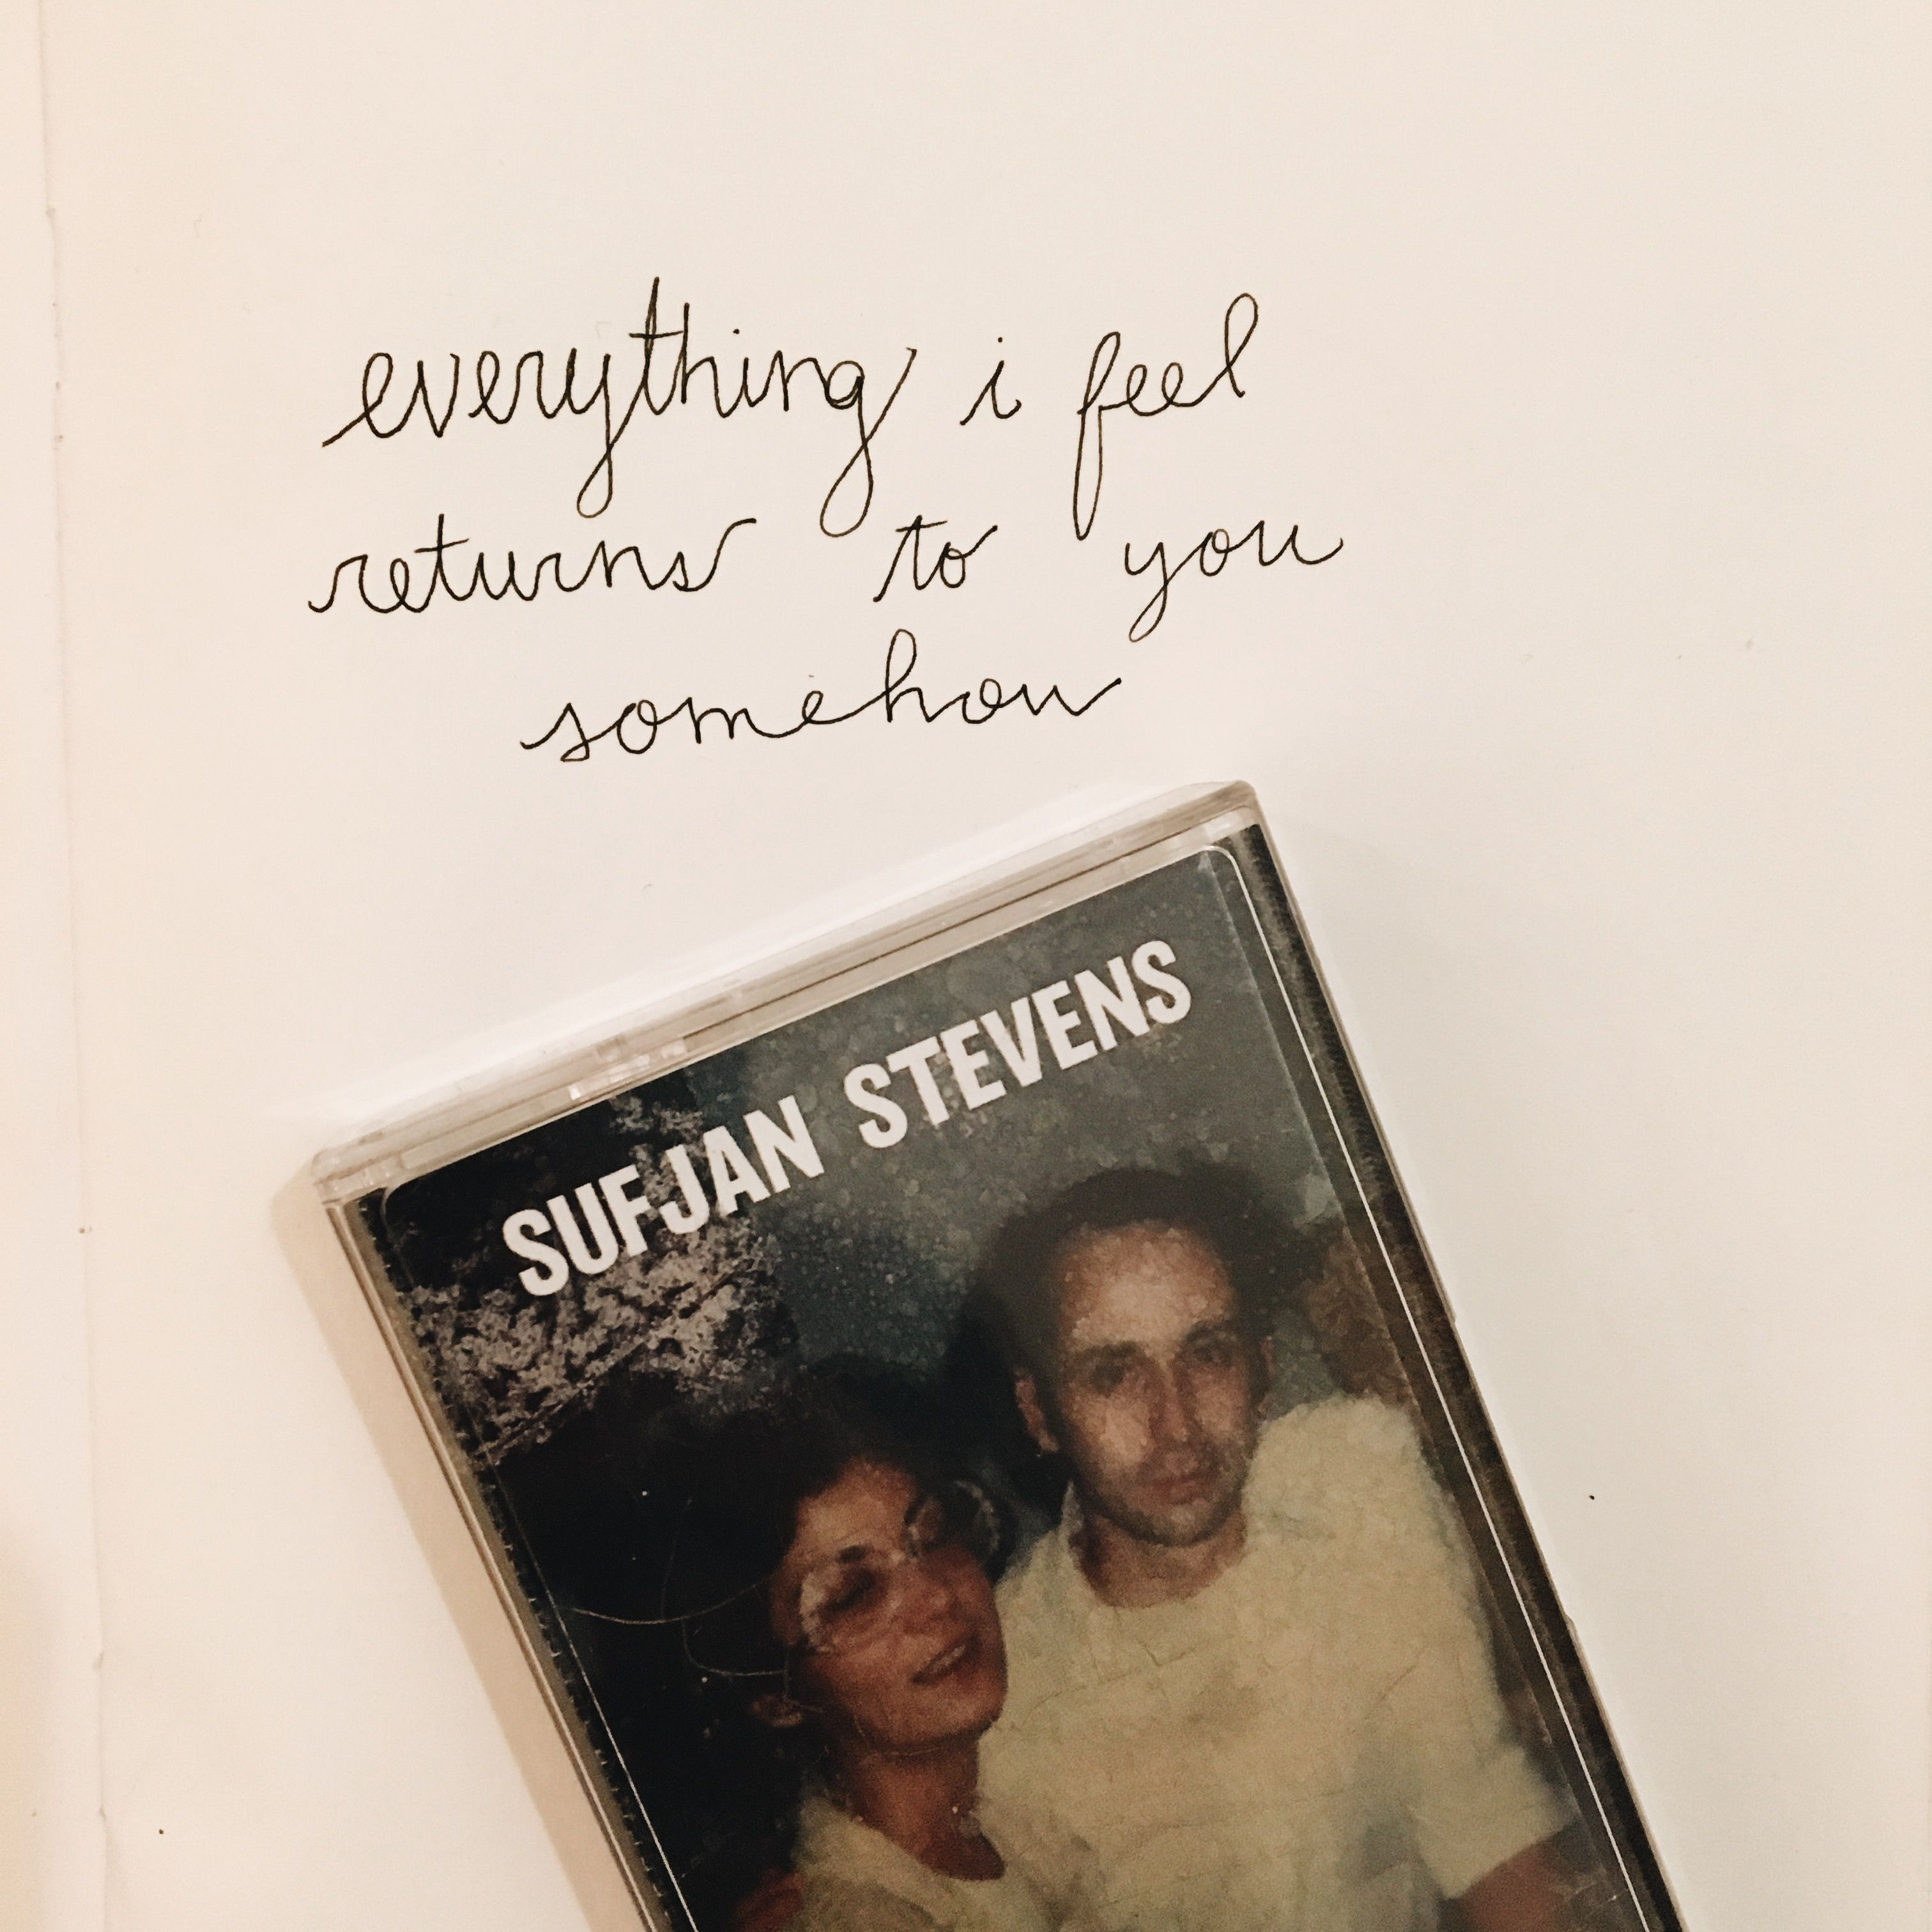 Sufjan Stevens Lyrics #sufjanstevens #lyrics #handwritten ...